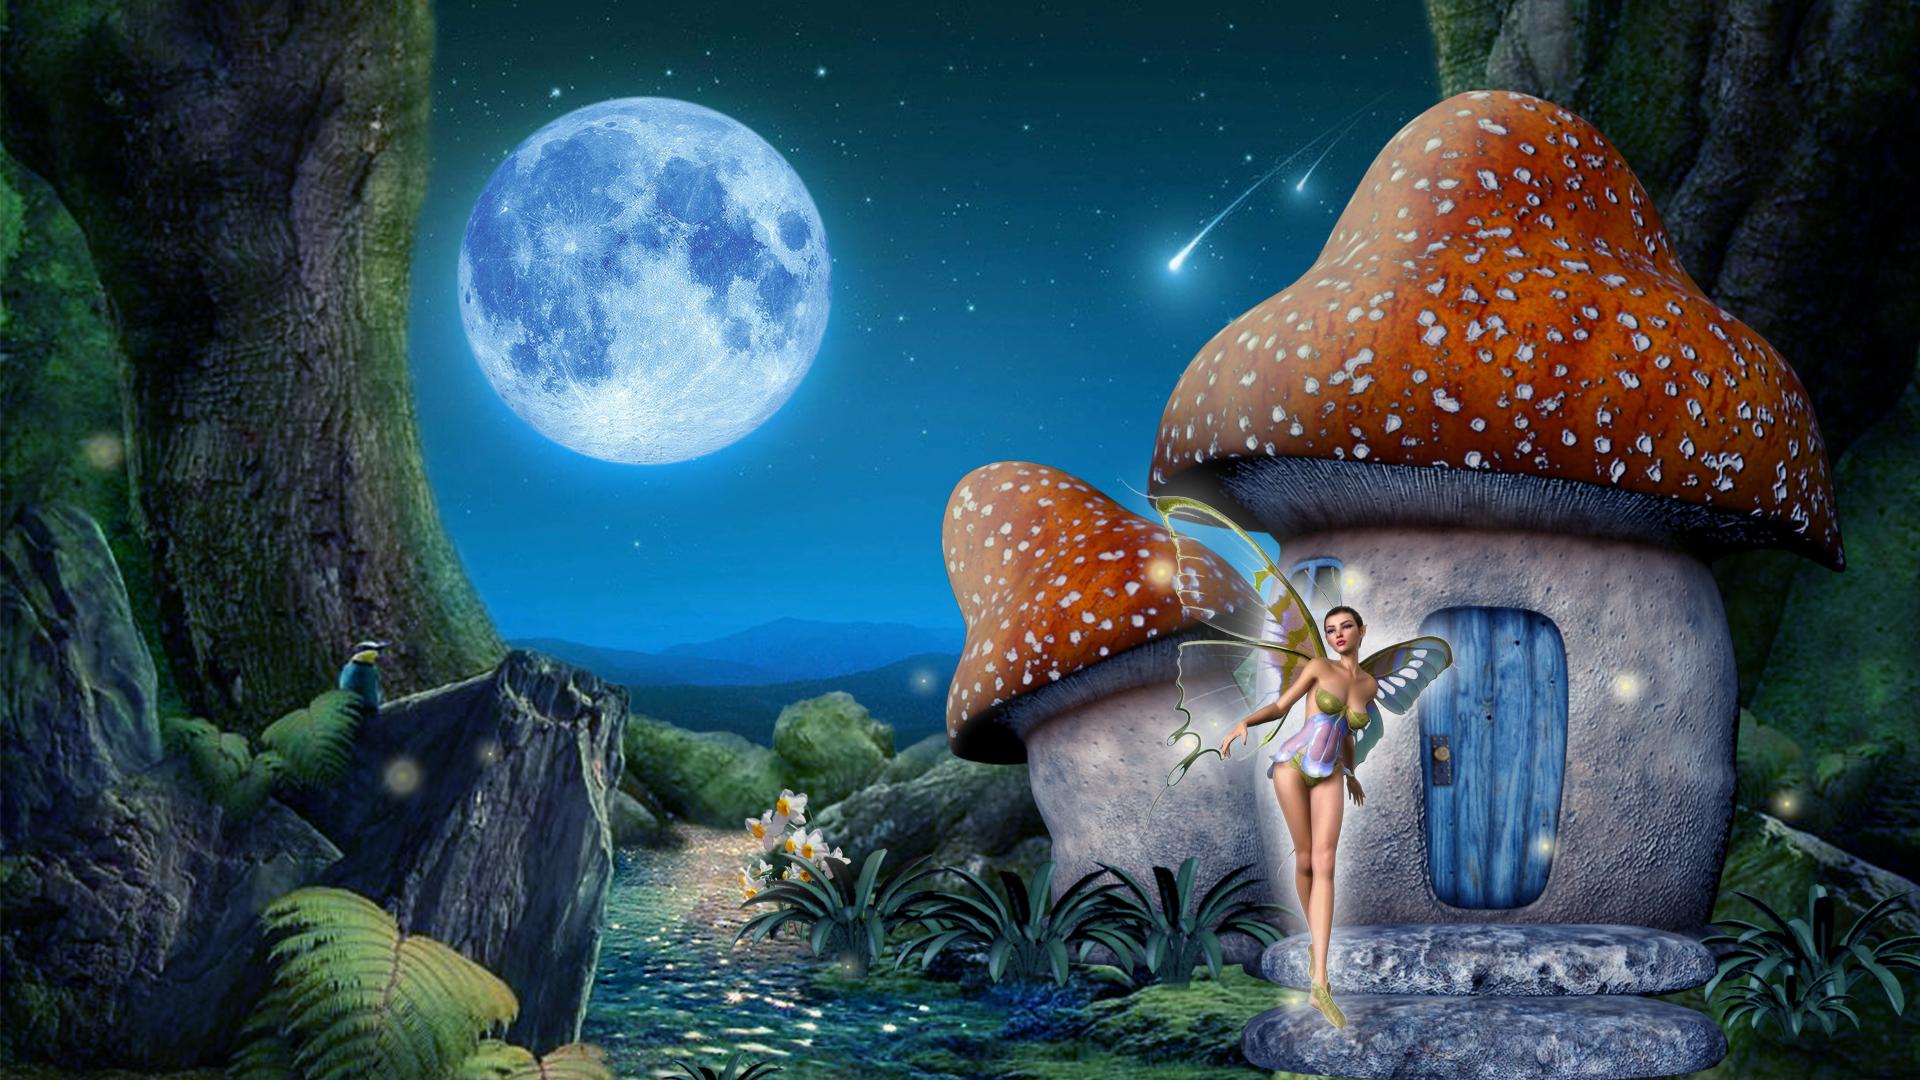 Mushroom Fairy House 蘑菇精灵屋